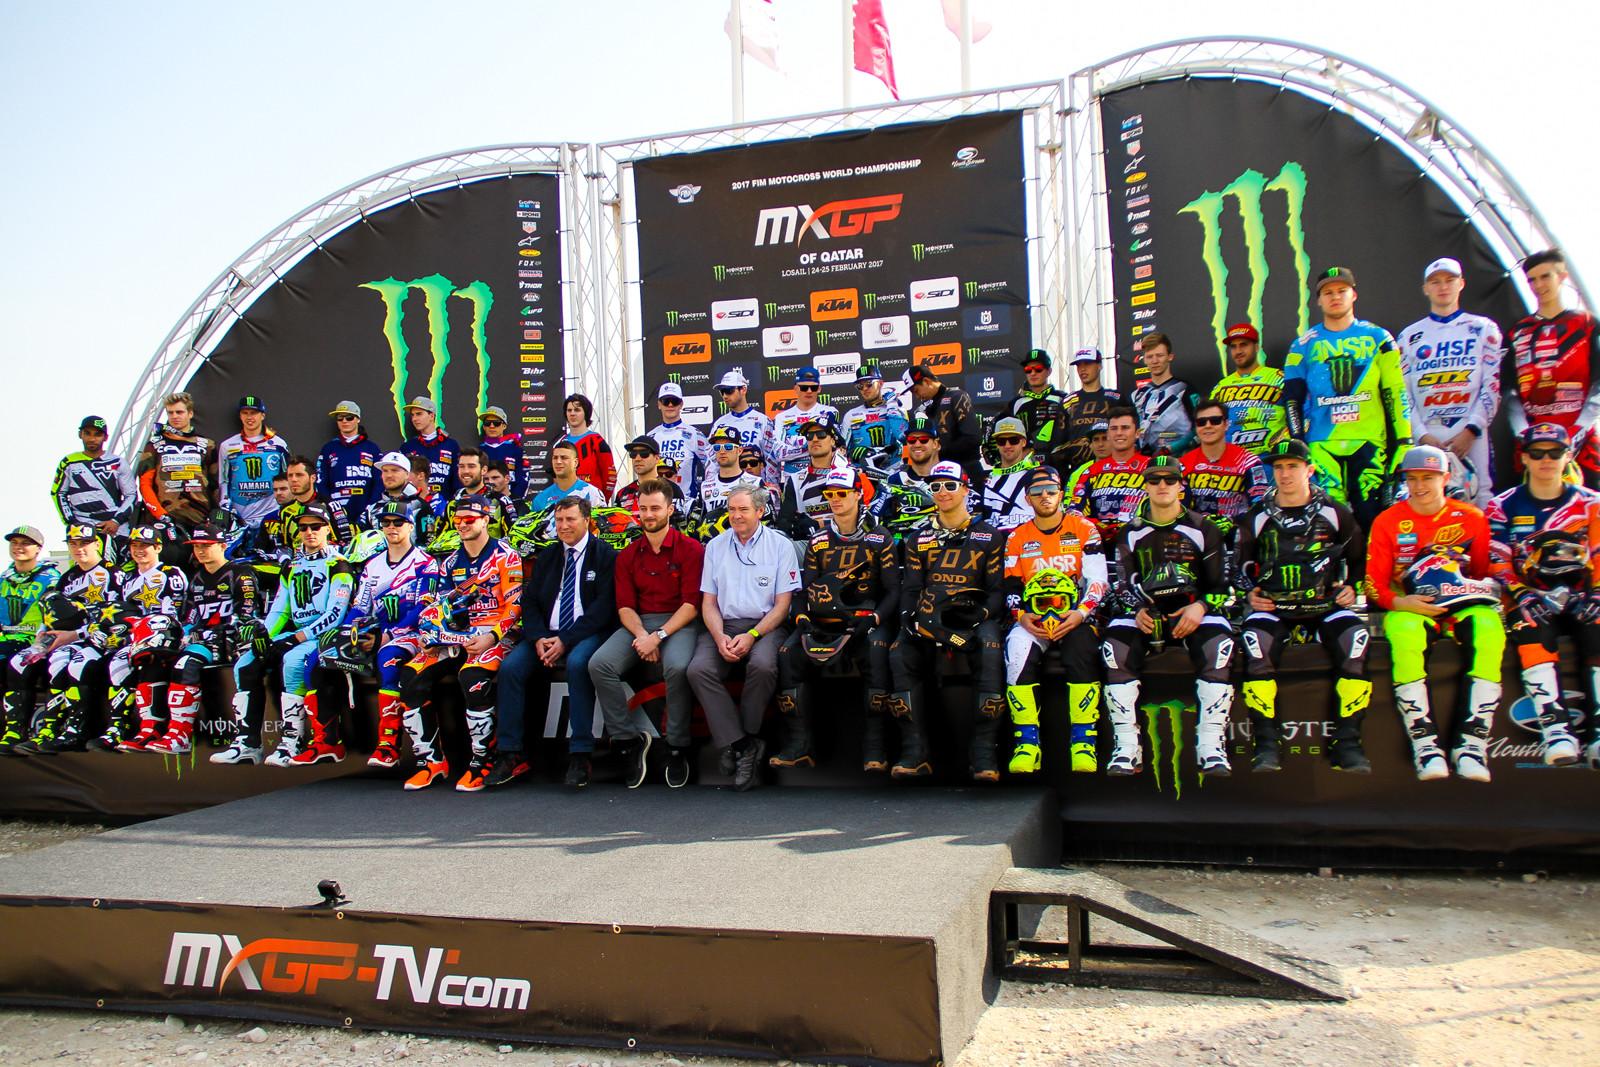 Riders of MXGP and MX2 - Photo Blast: 2017 MXGP of Qatar - Motocross Pictures - Vital MX